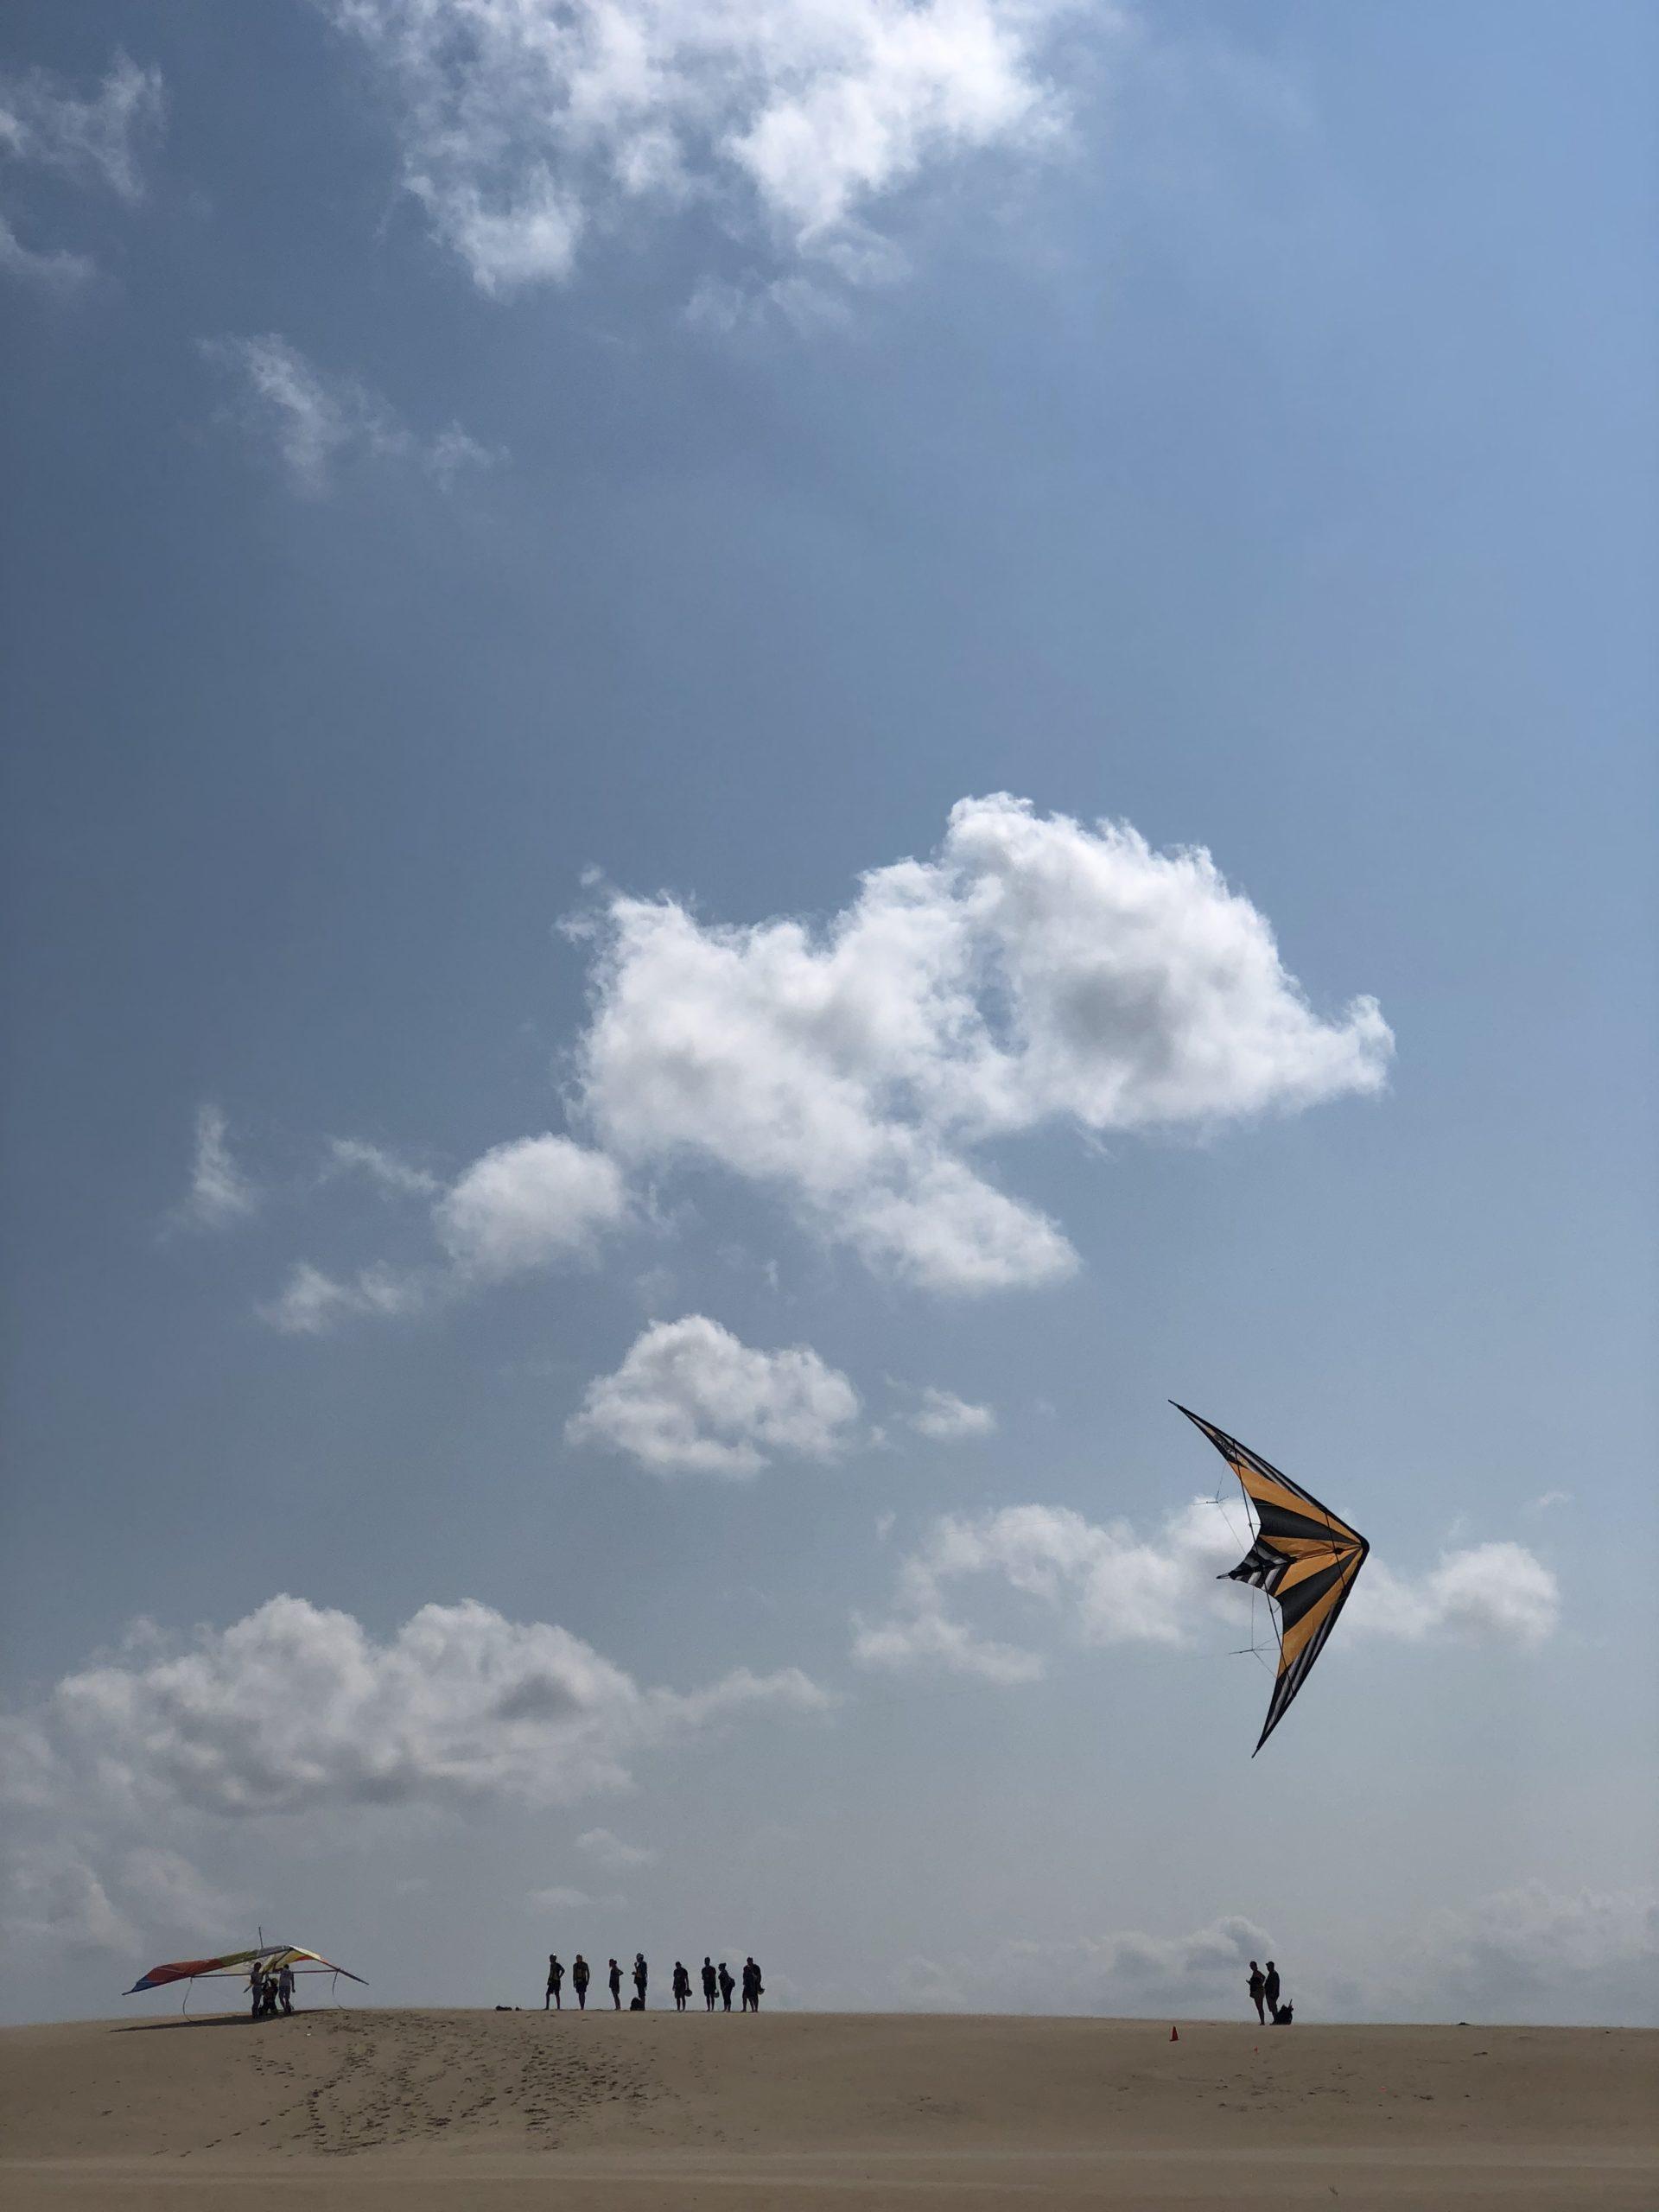 Flying a dual line stunt kite at Jockeys Ridge State Park